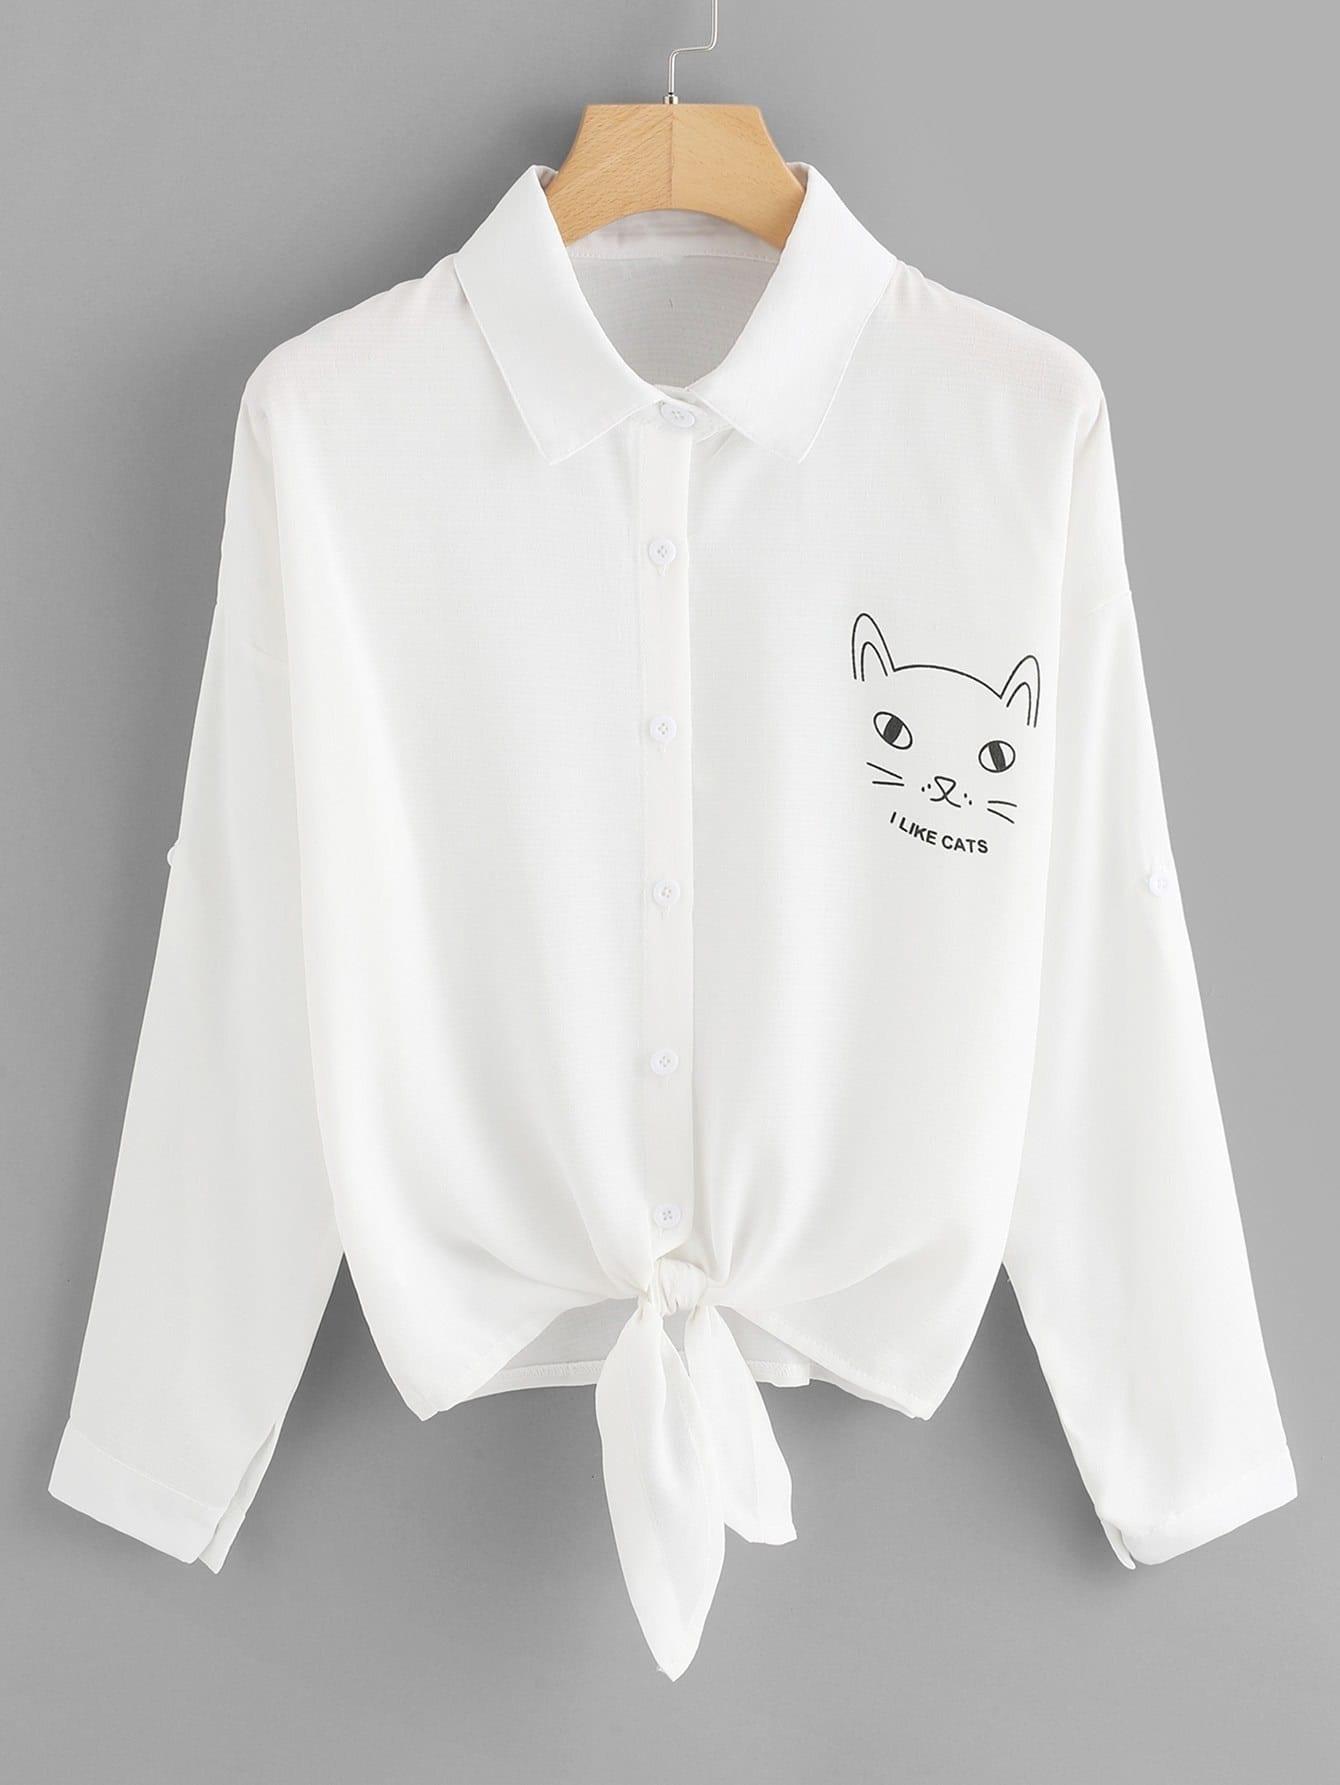 Cartoon Print Knotted Shirt blouse180305101